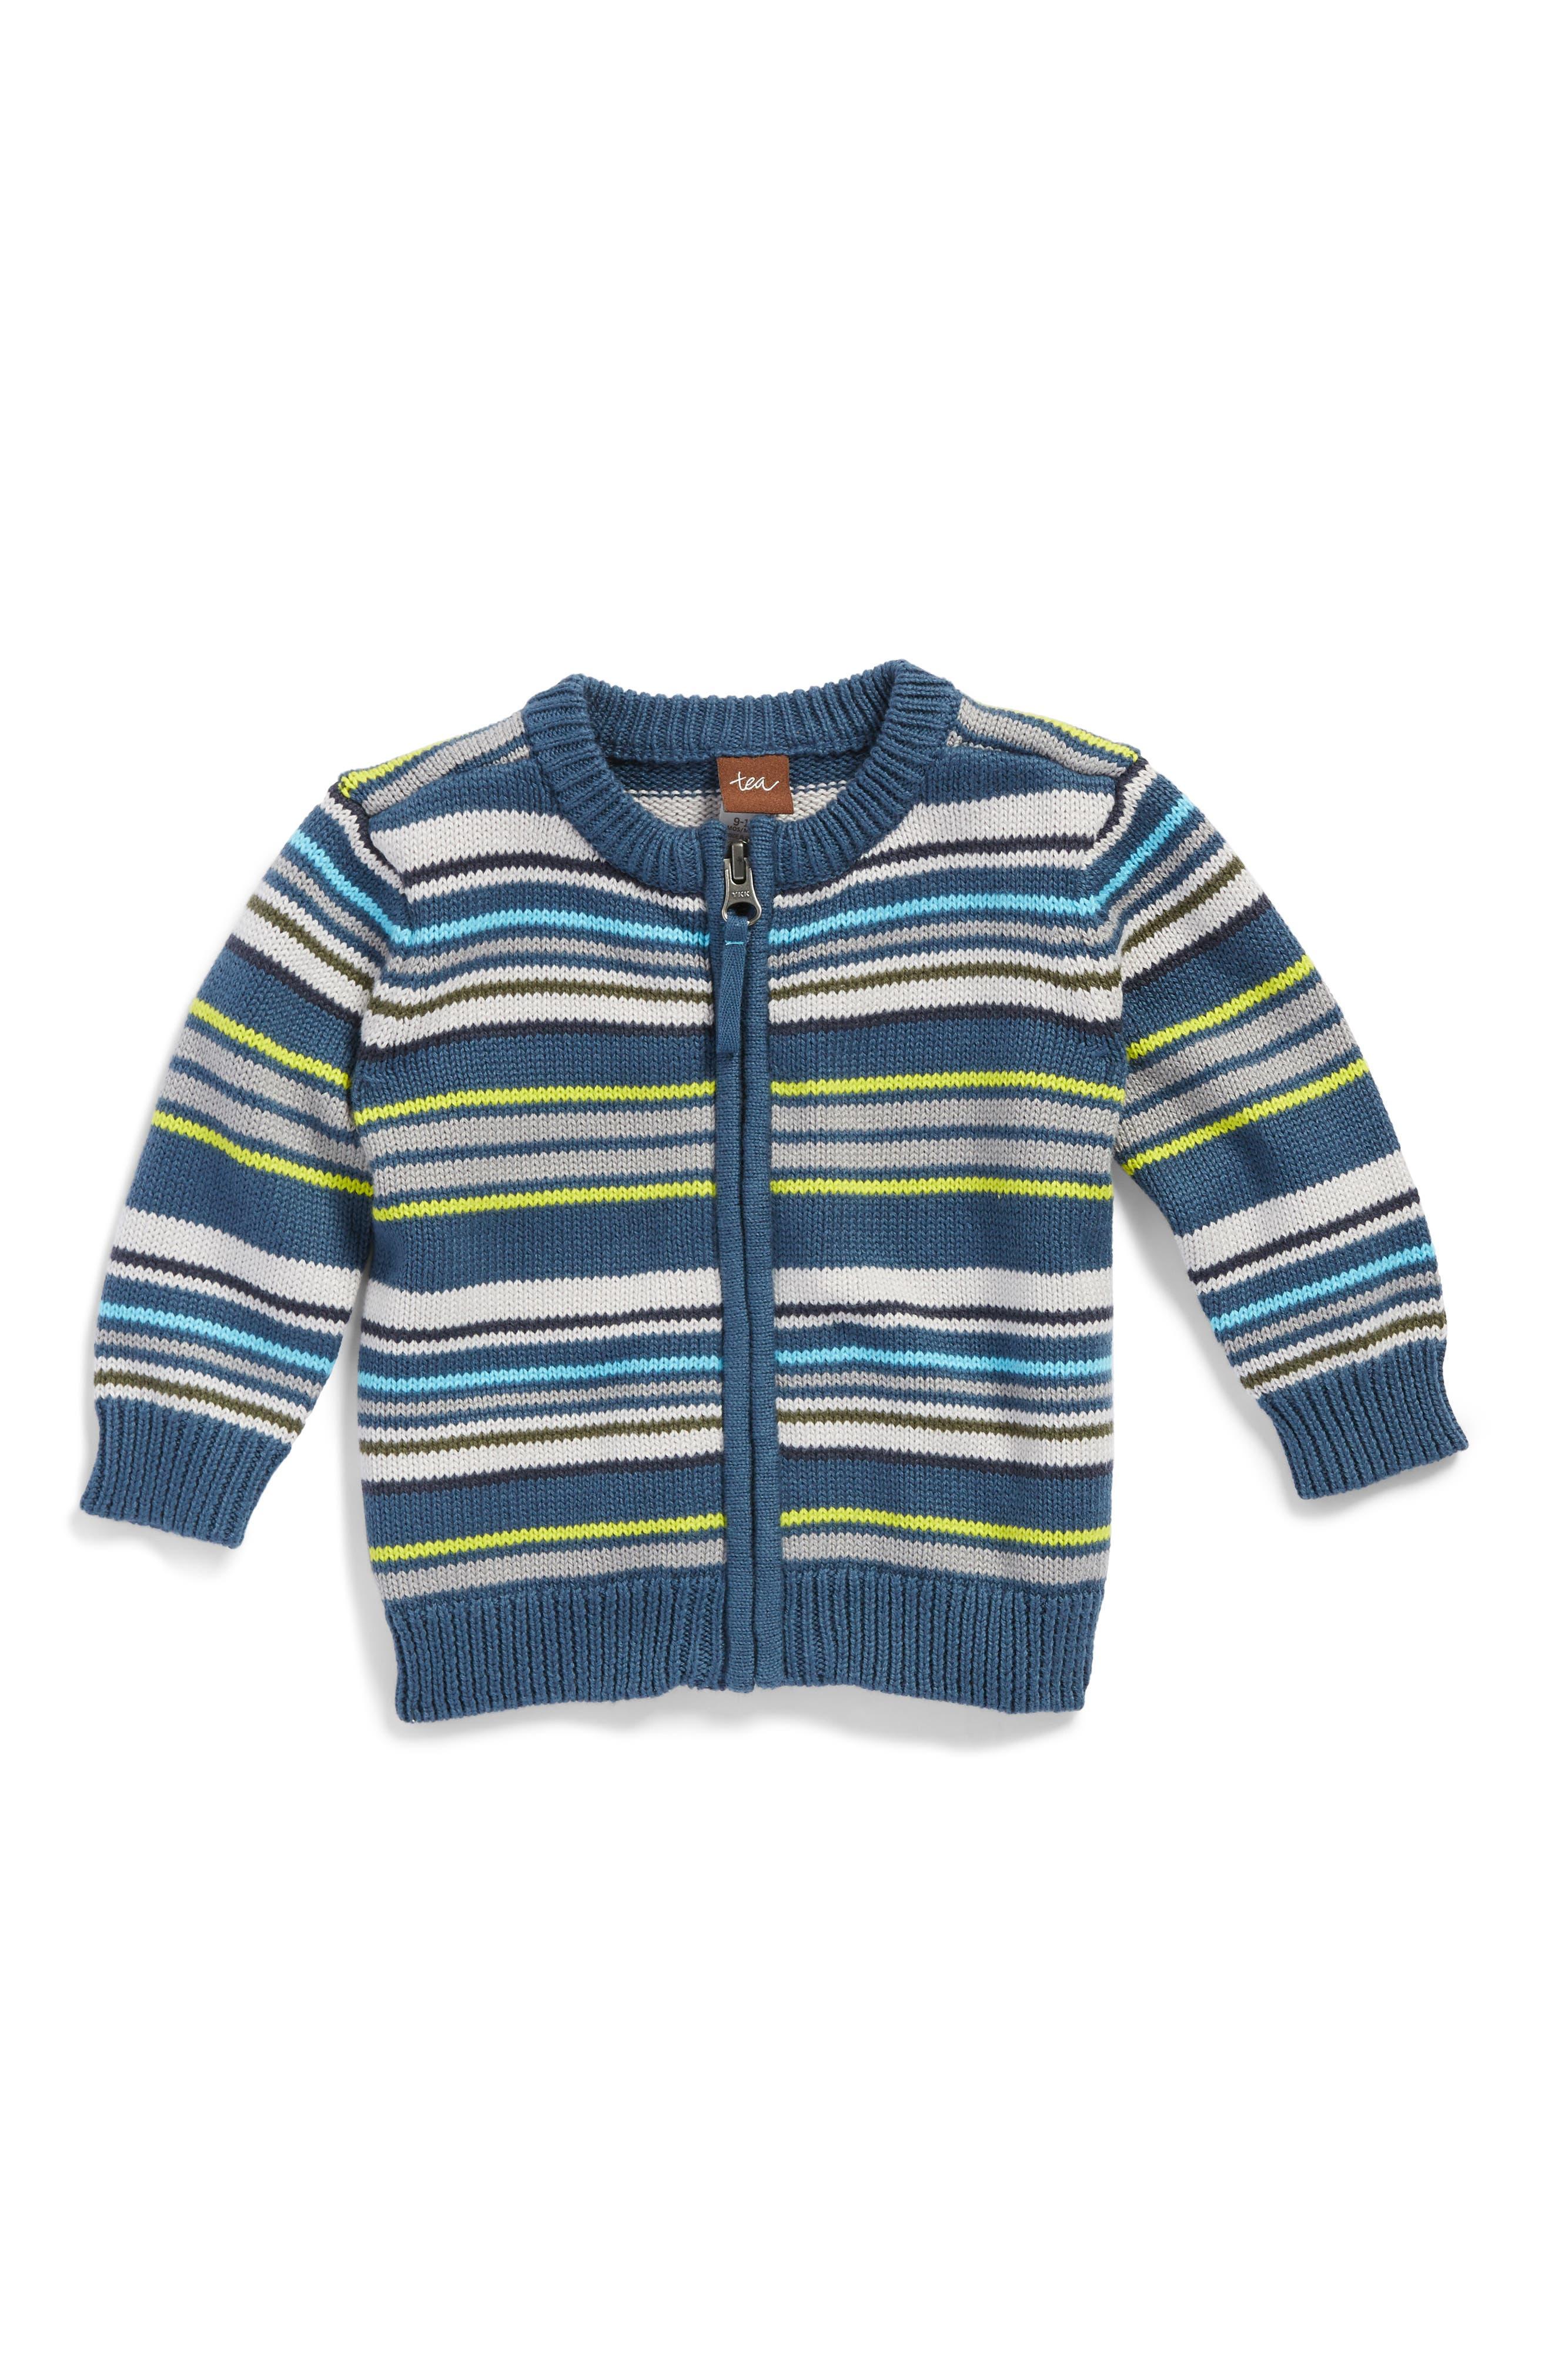 Main Image - Tea Collection Gavin Stripe Zip Cardigan (Baby Boys)